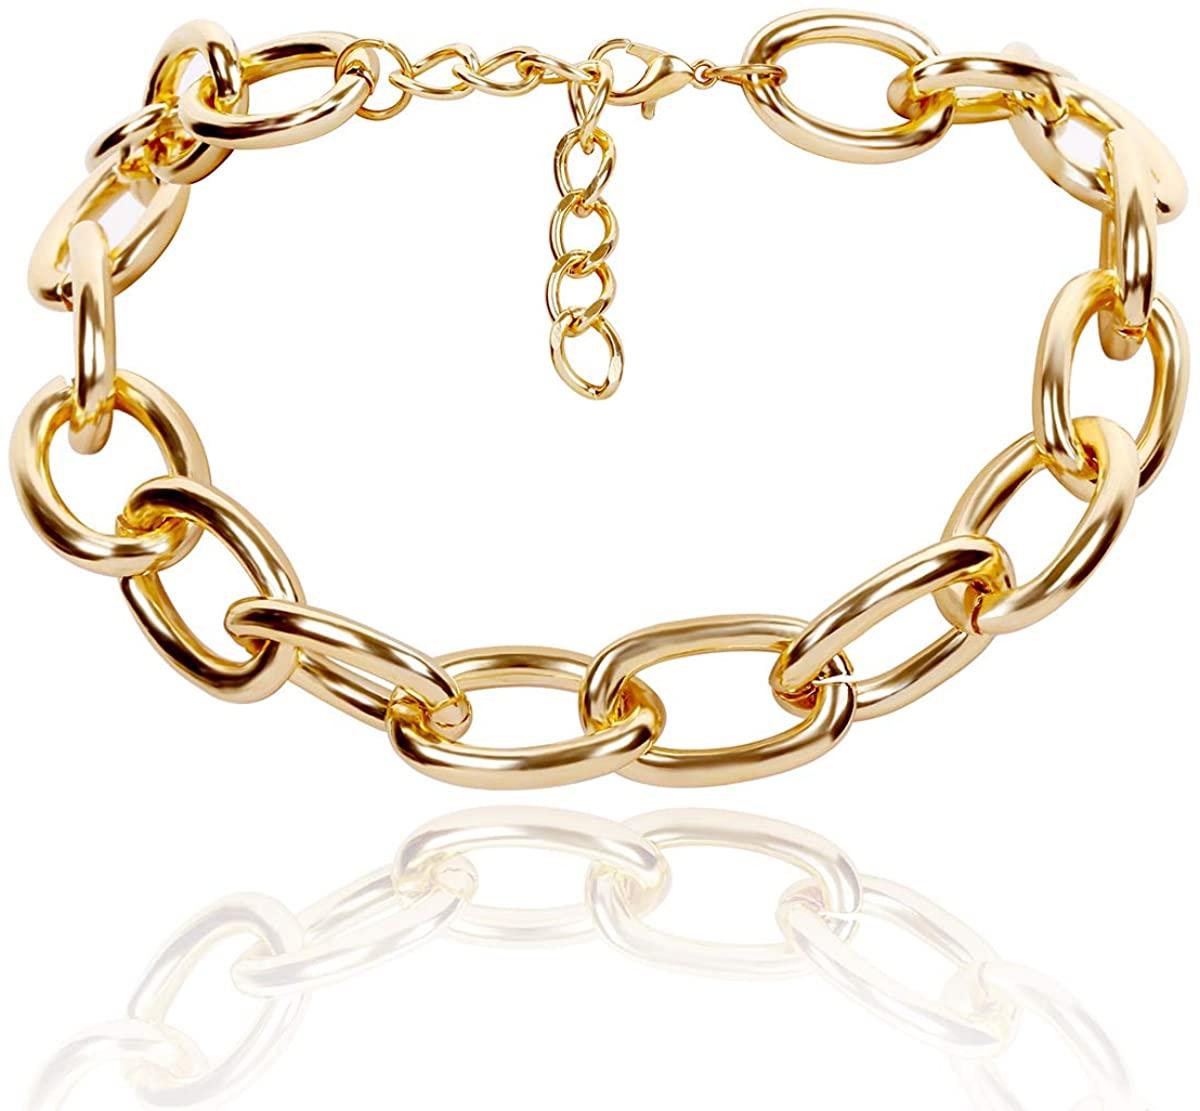 jinlu Gold Plated Cross Chain Choker Necklace for Women